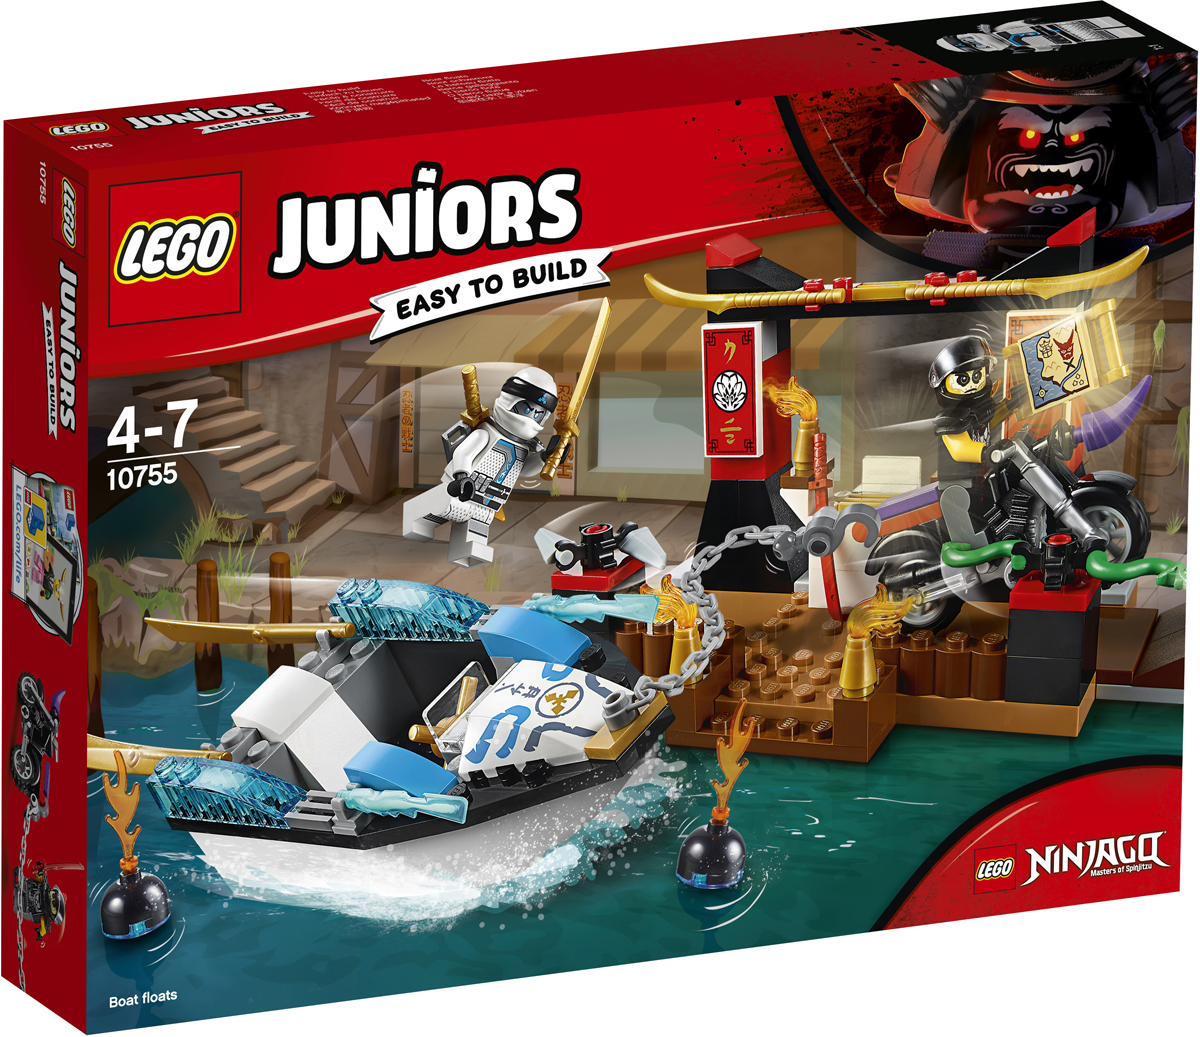 LEGO Juniors Конструктор Погоня на моторной лодке Зейна 10755 конструктор lego juniors ветеринарная клиника мии 10728